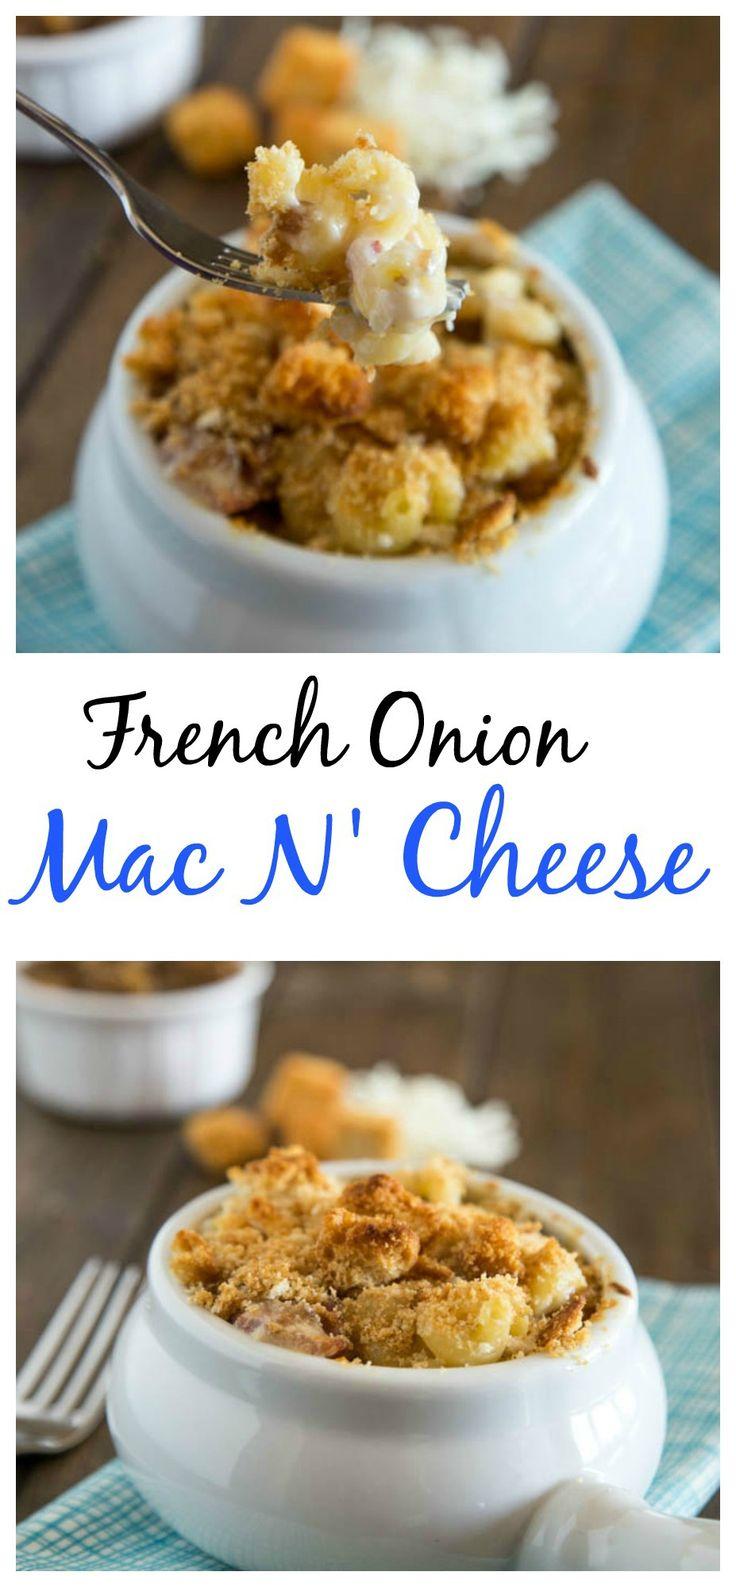 French Onion Mac N' Cheese – Creamy mac n' cheese with ...